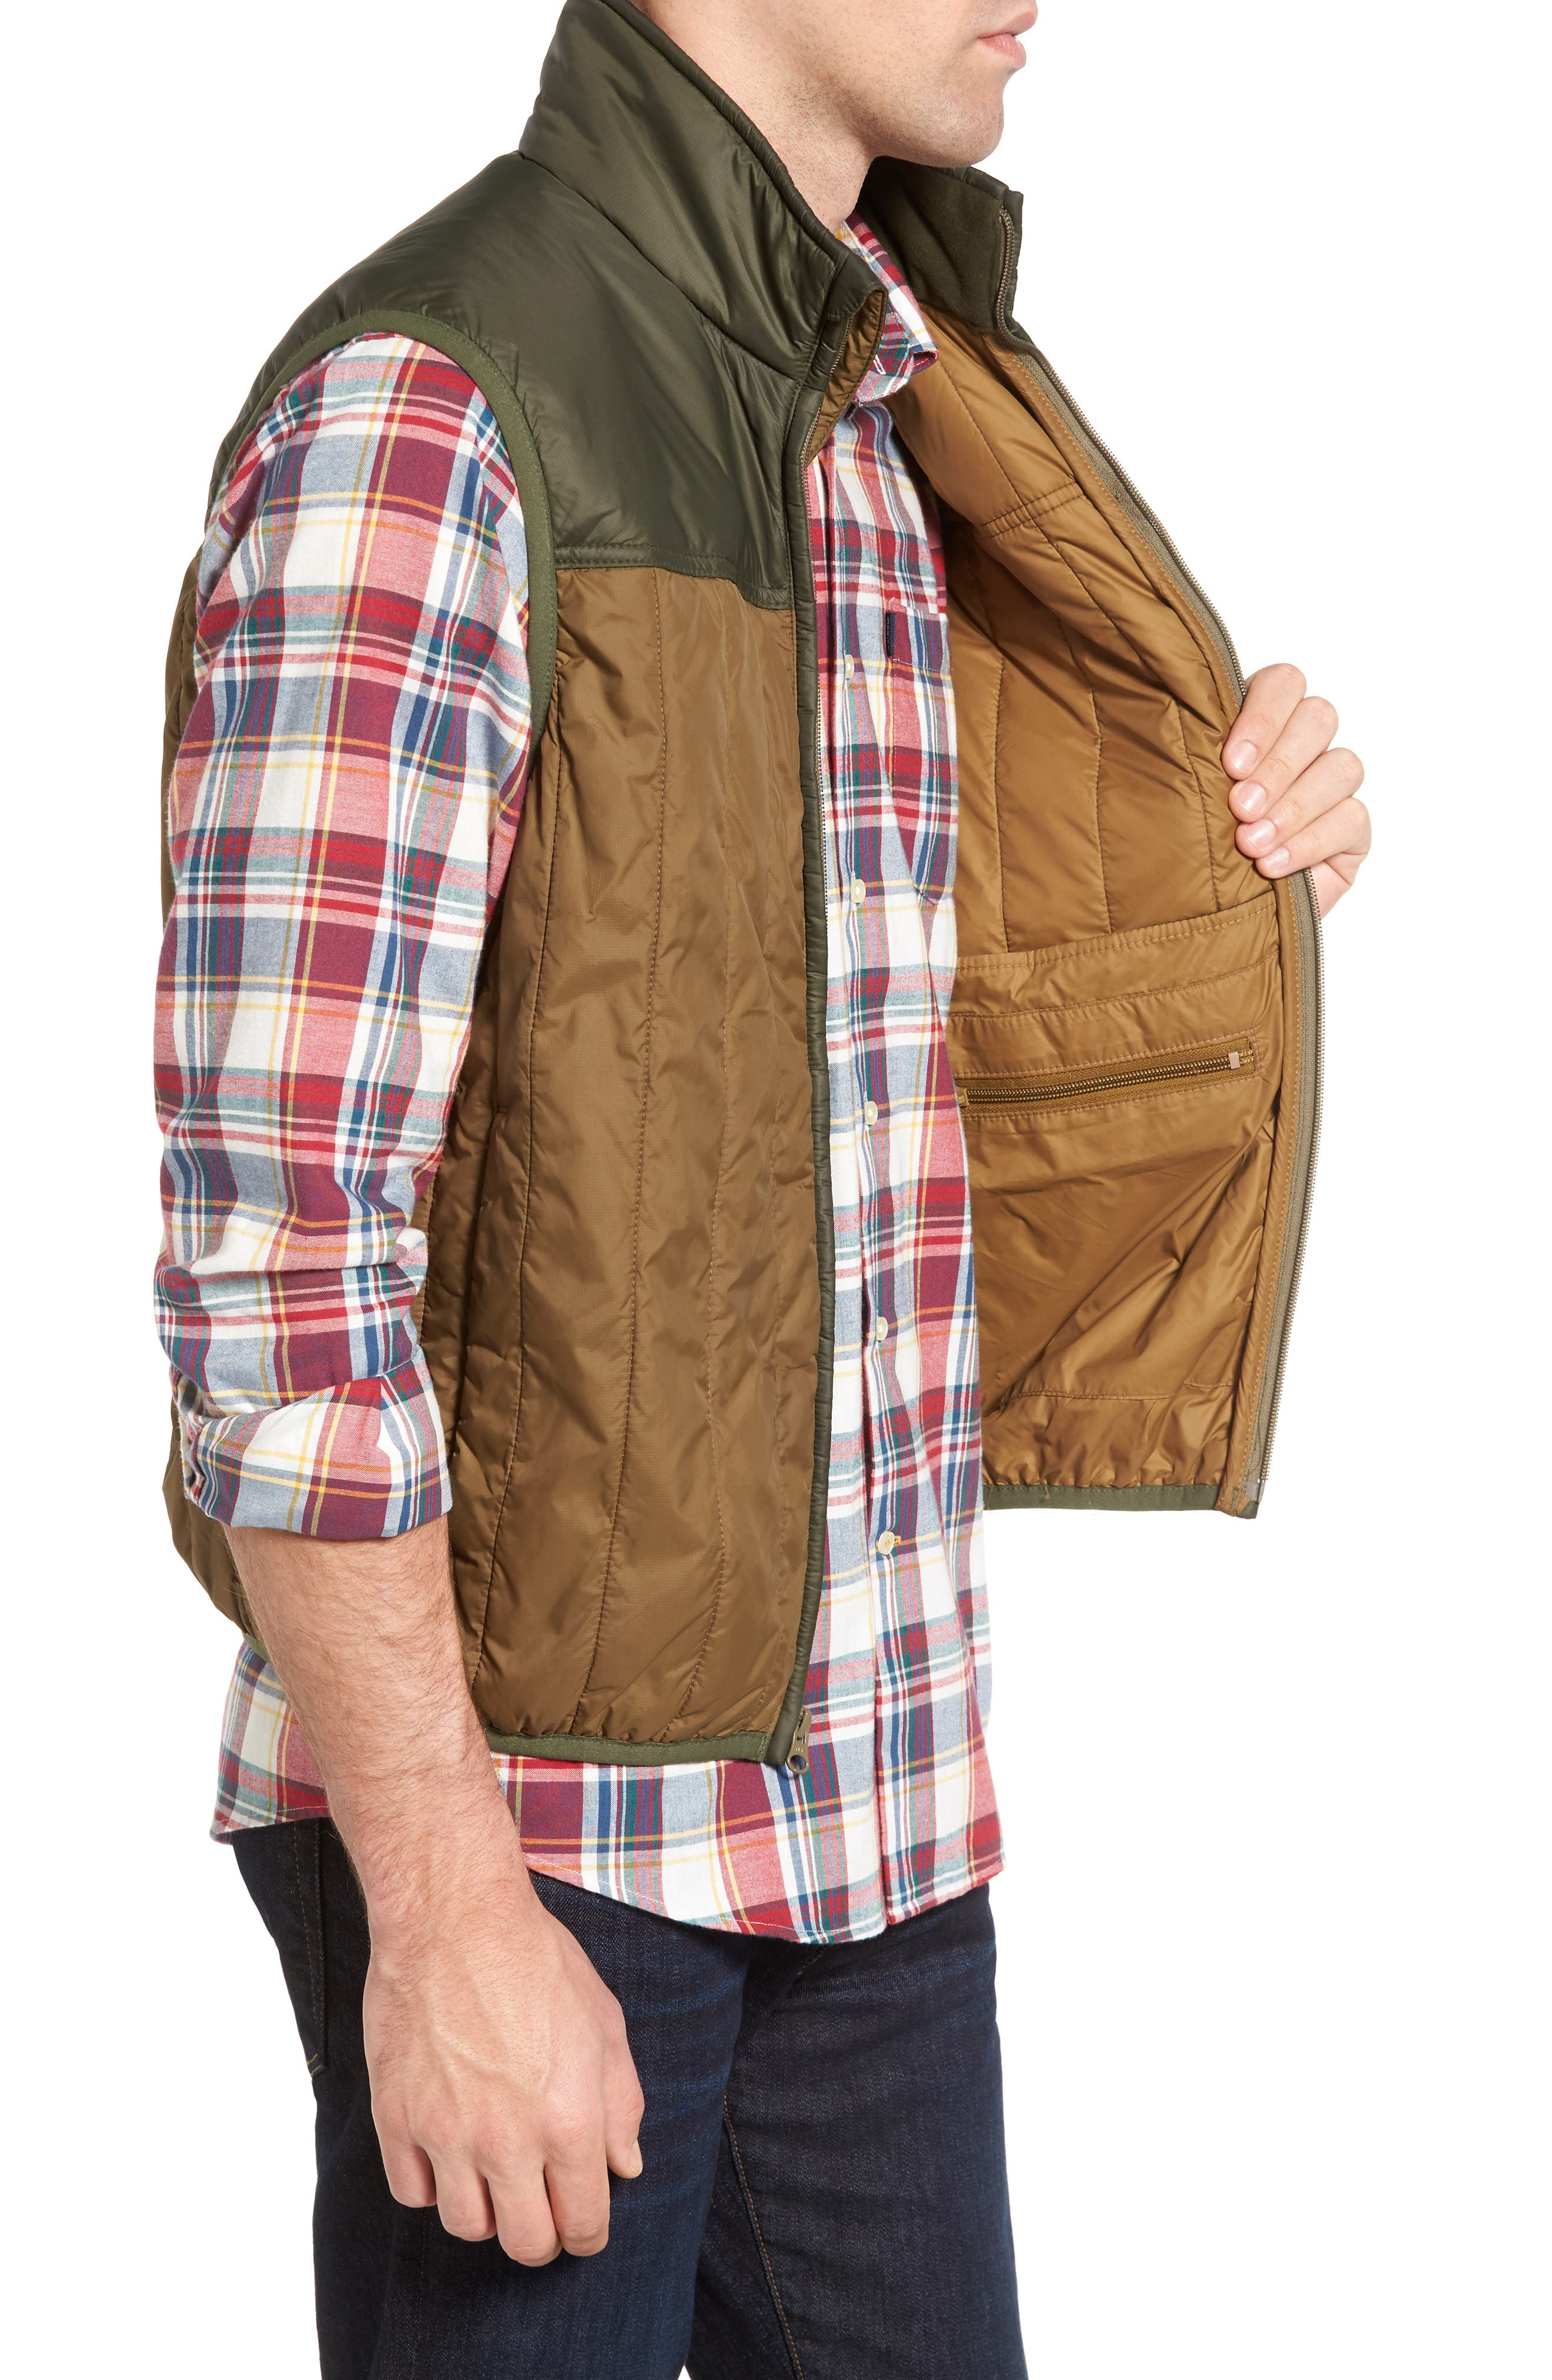 Ultra Light Vest,                             Alternate thumbnail 3, color,                             Field Olive